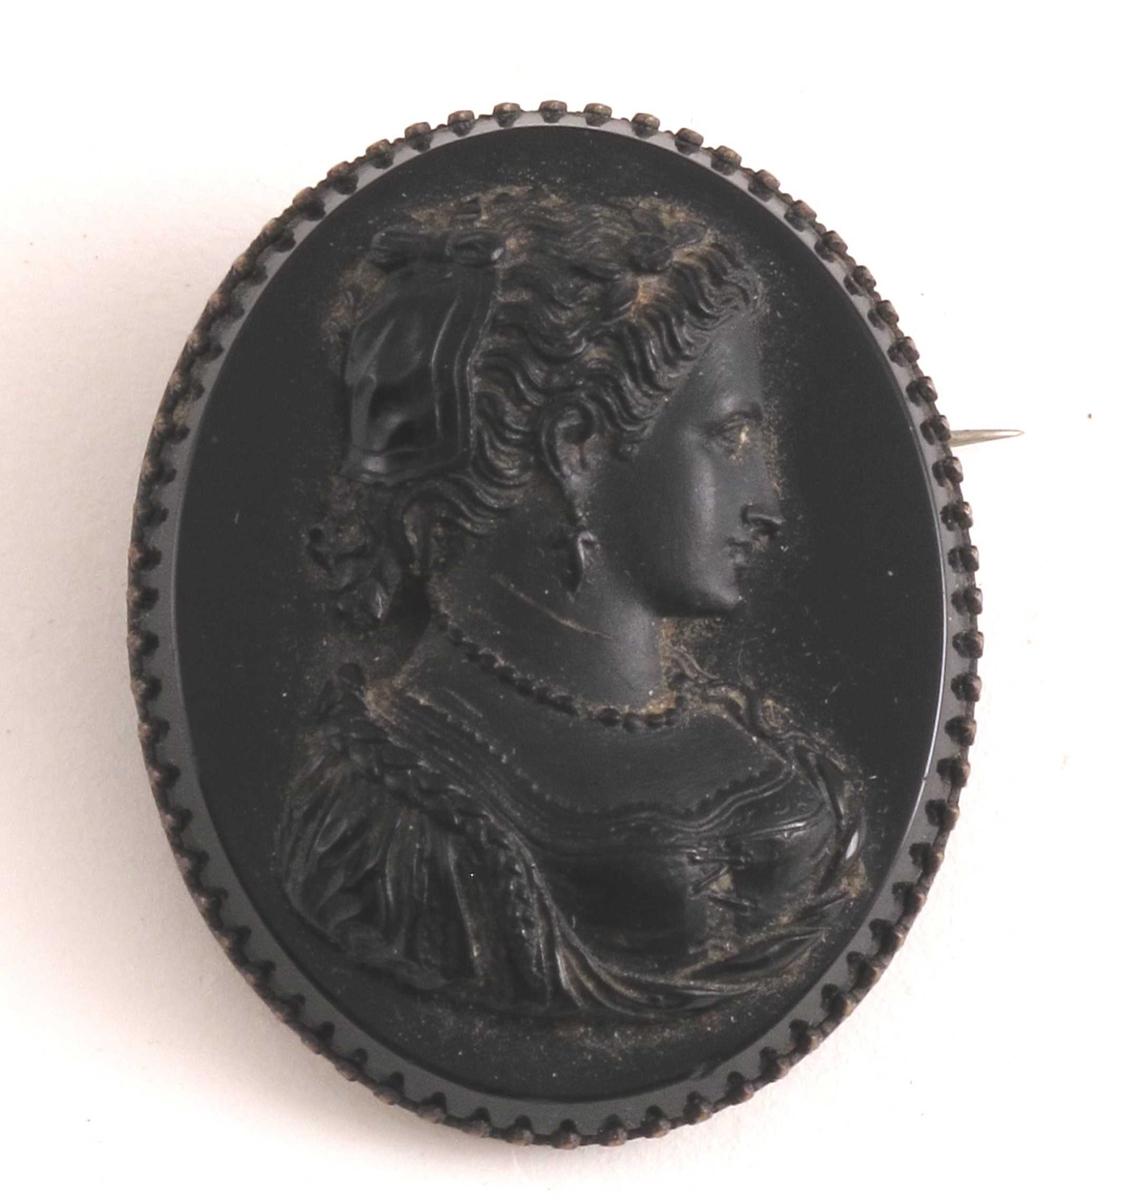 Kvinne i profil, utskåret i relieff